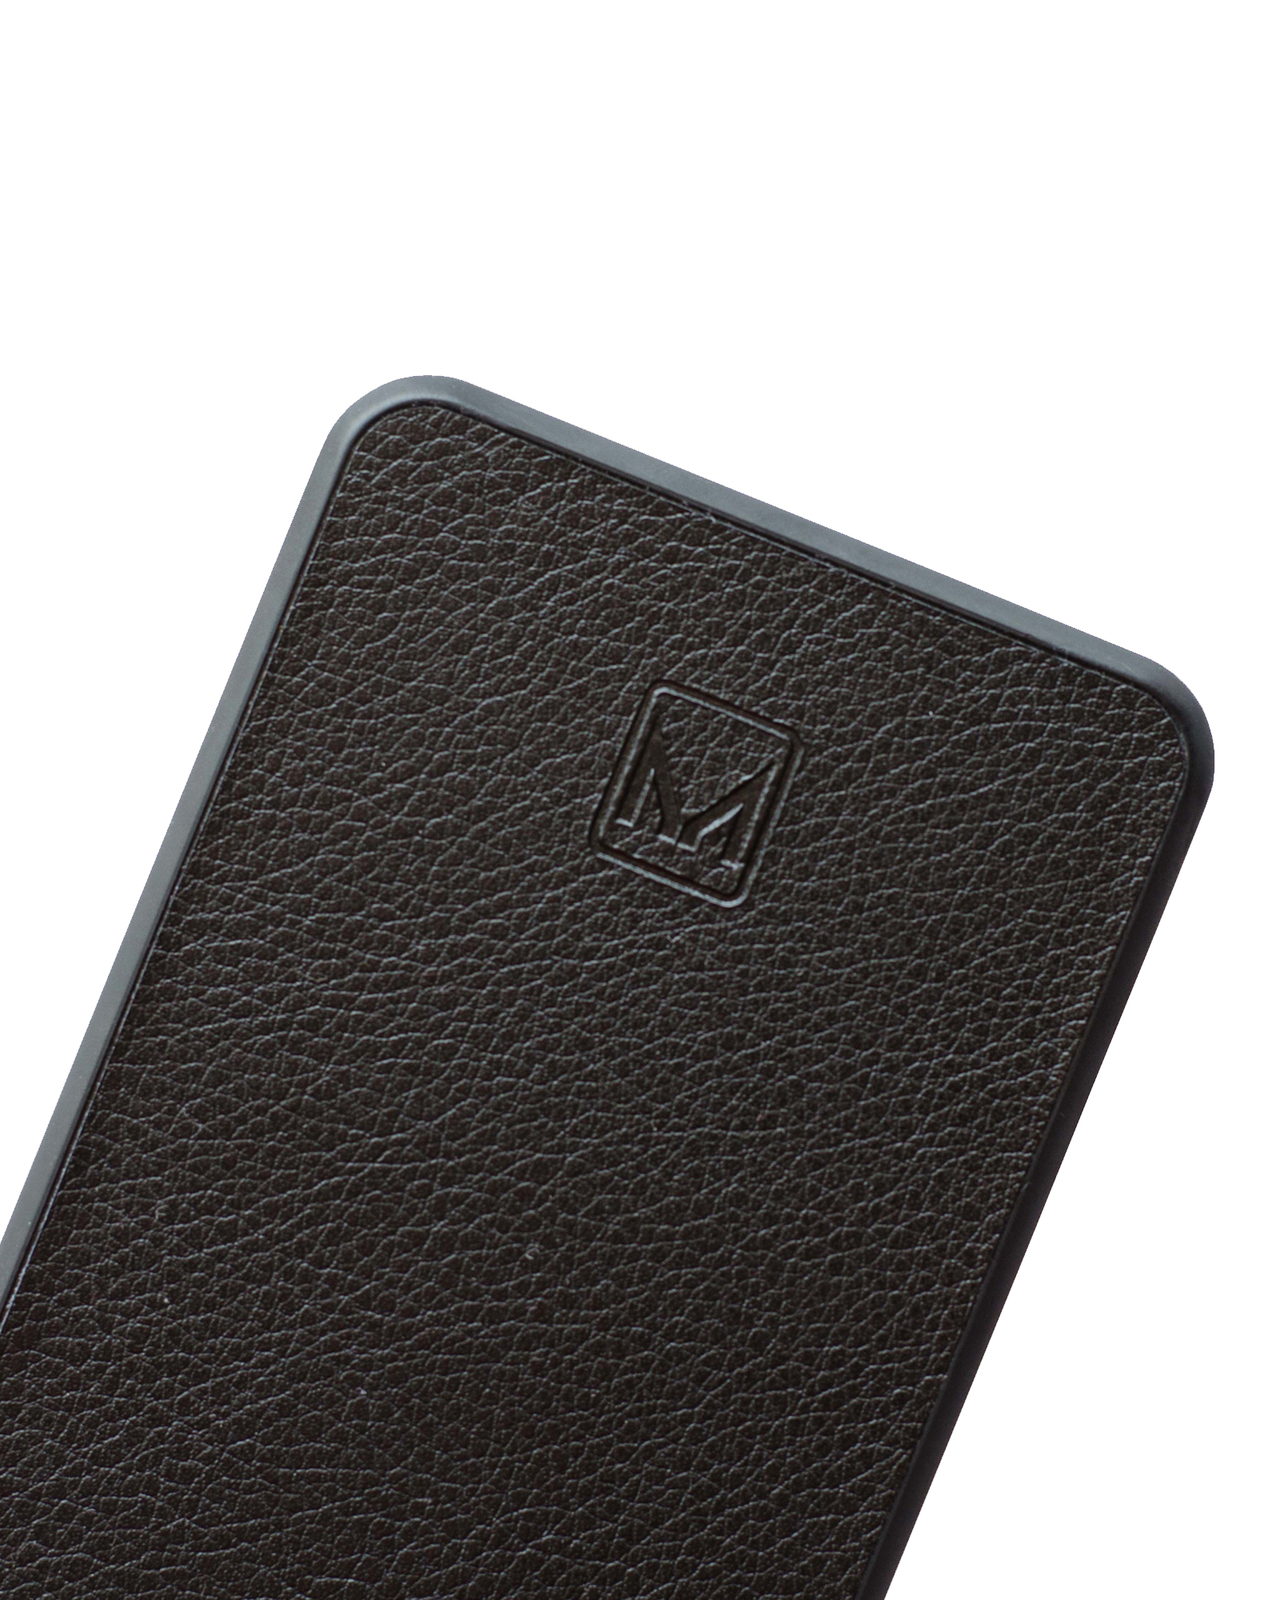 Moyork WATT 6000 mAh Leather Power Bank - Raven Black image